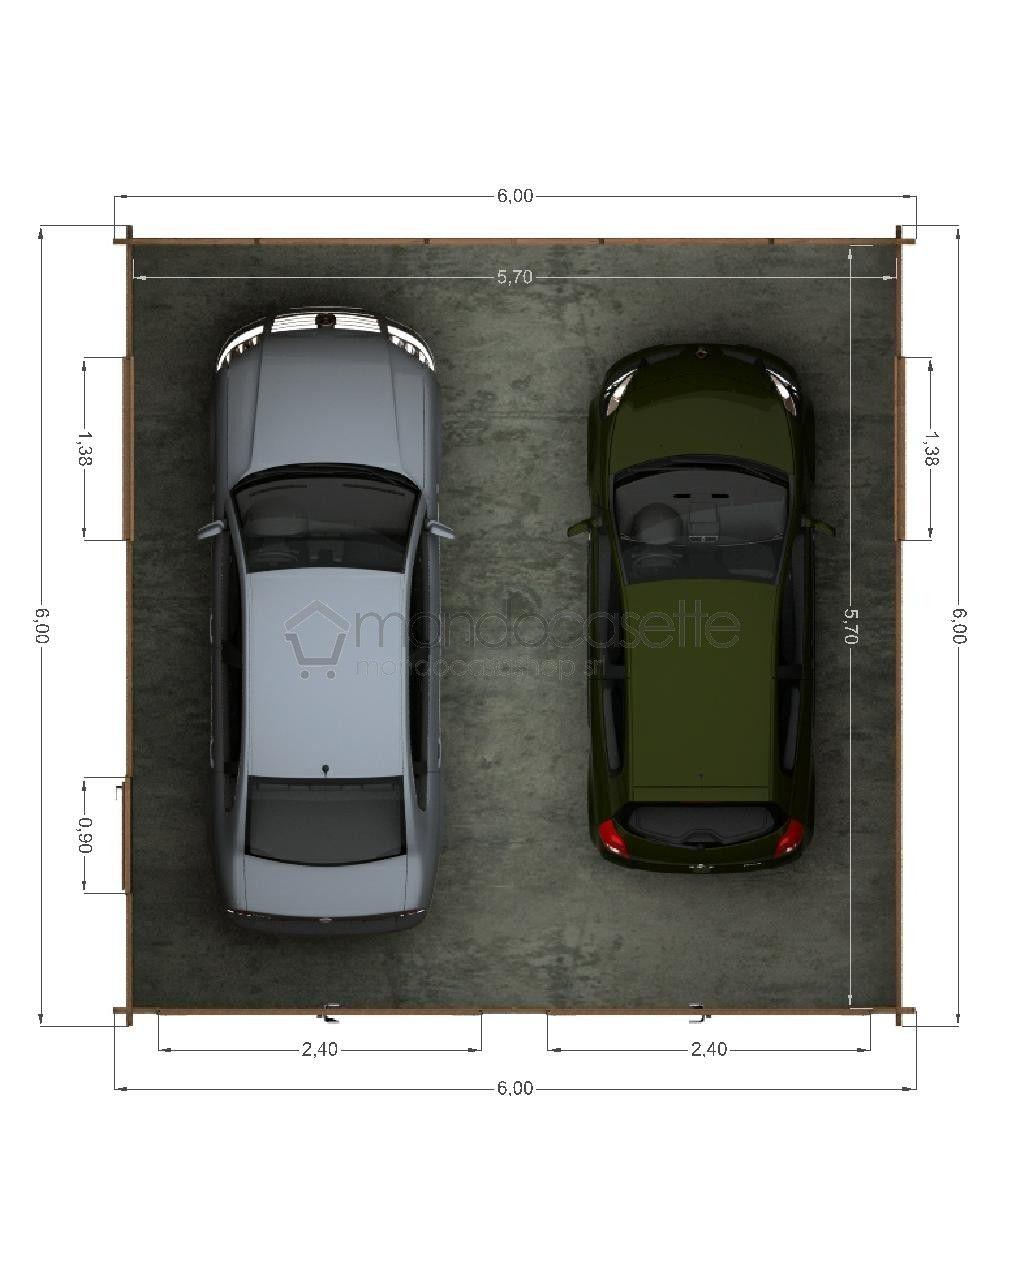 Cochera Dos Autos Medidas Garage In Legno 3 6x6 Cochera Garaje Planos